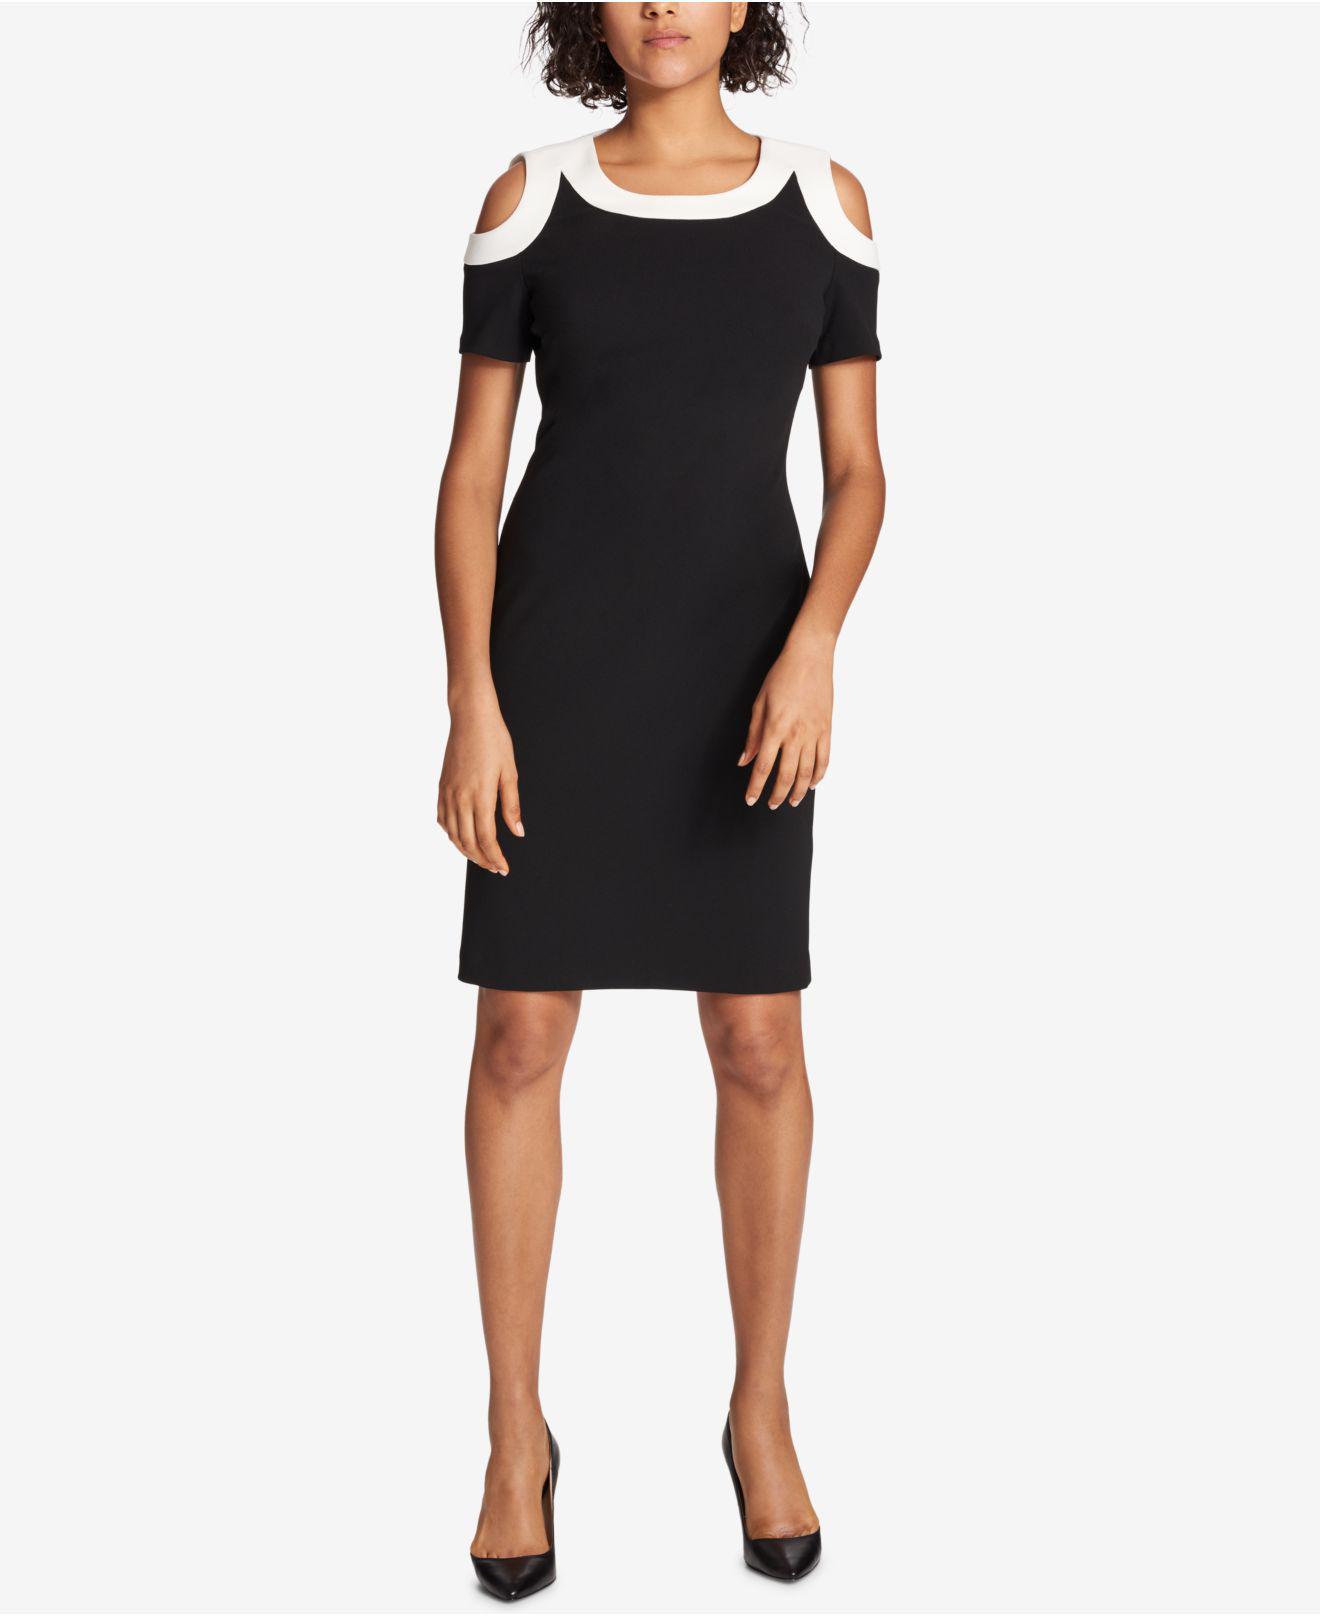 Ivory Black Sheath Dress